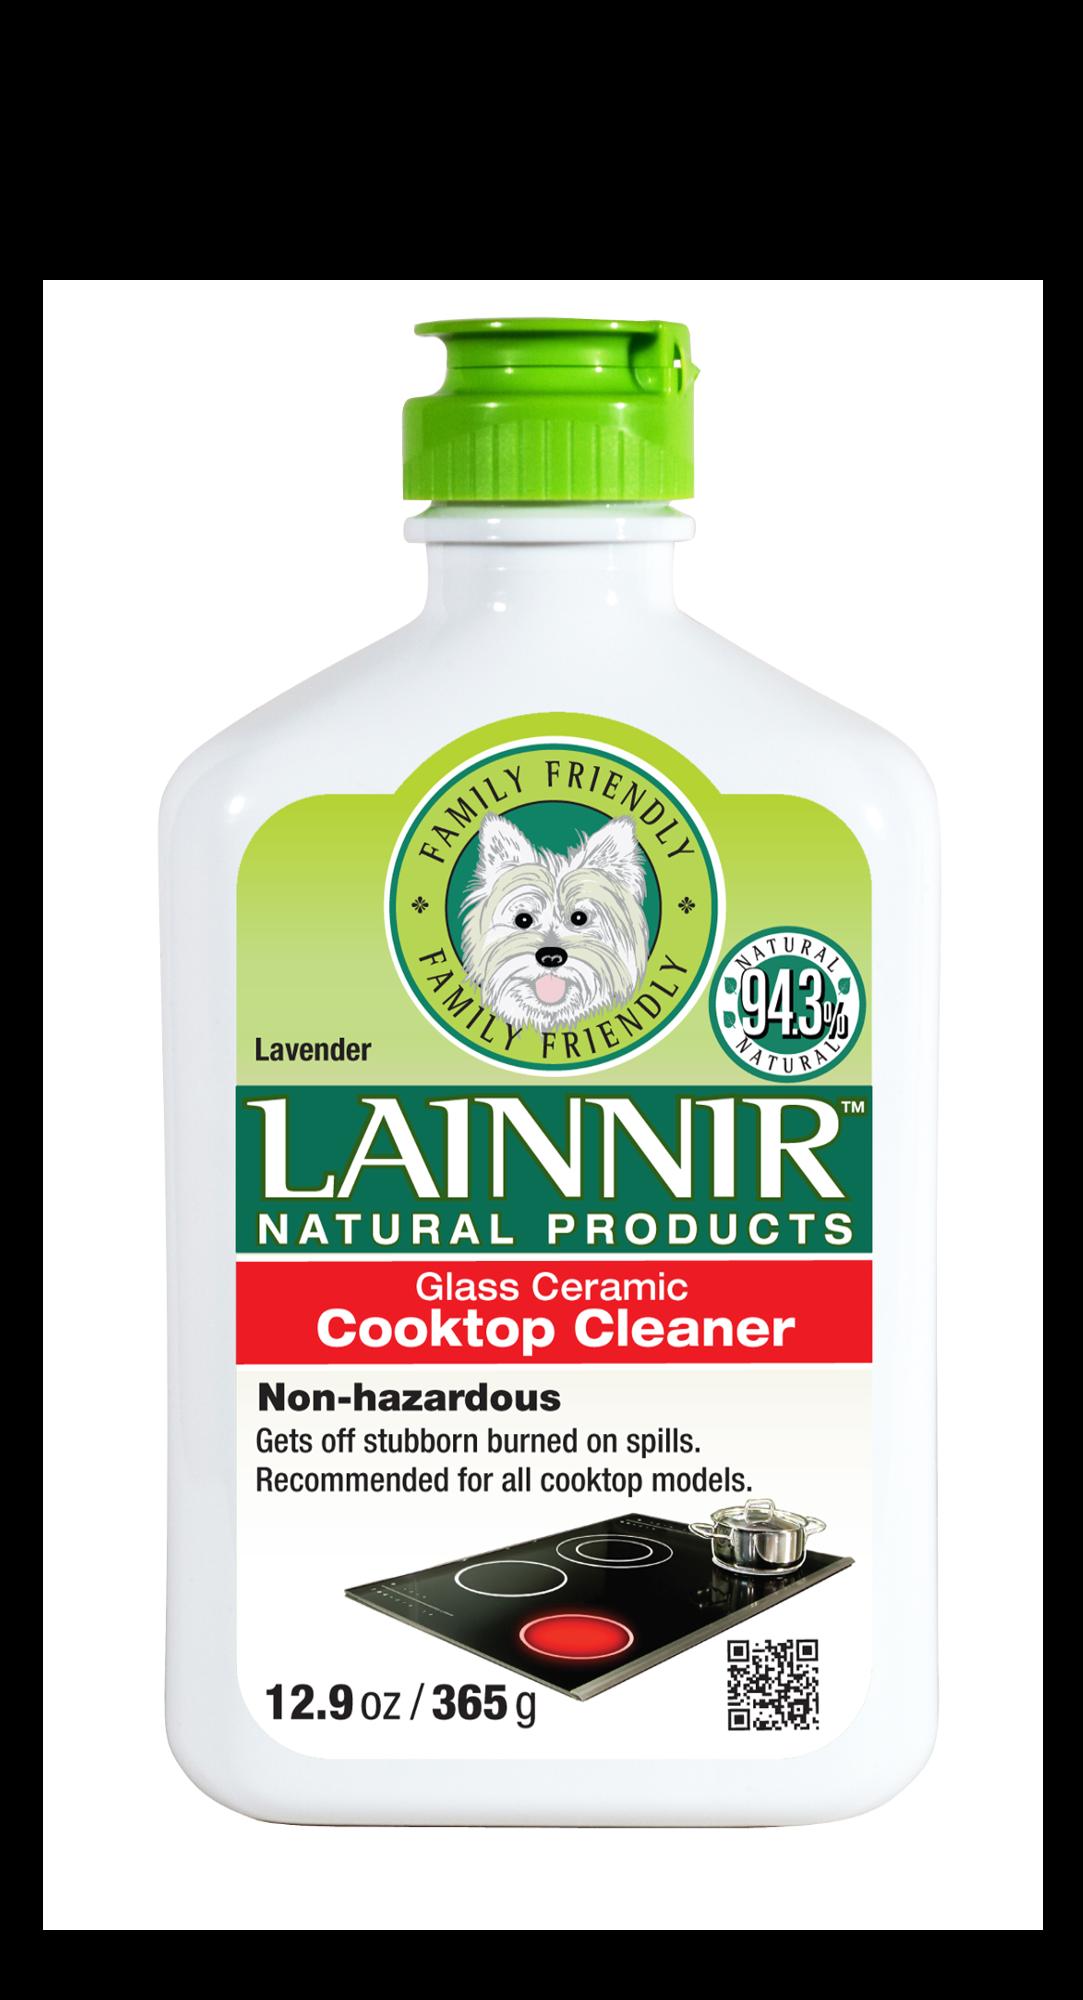 Lainnir Cooktop Cleaner US Crop